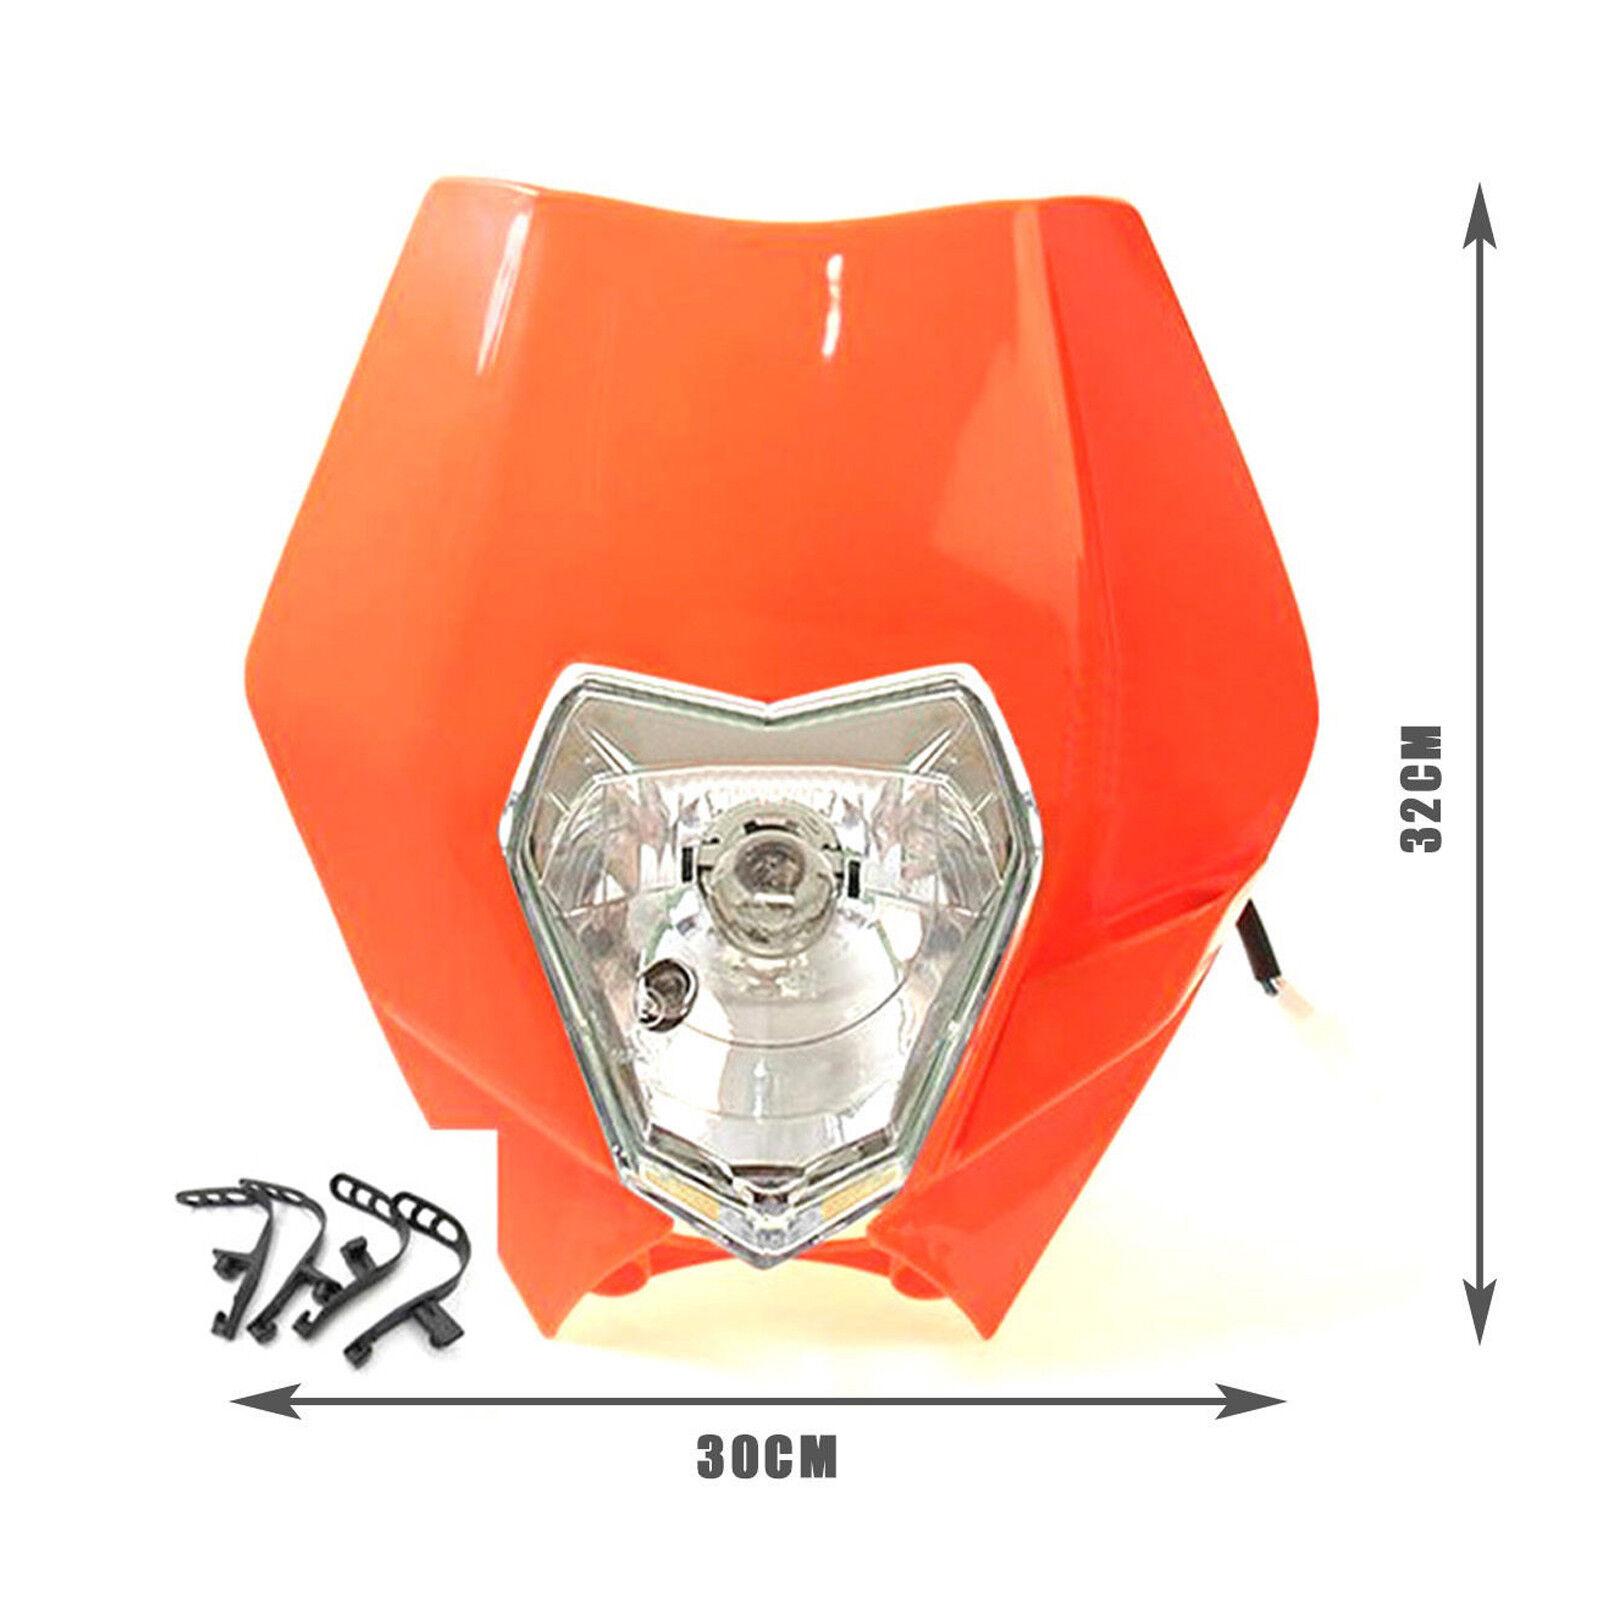 Dirt Bike Racing S2 Headlight Fairing For Honda Yamaha SX XCF XCW Headlamp | eBay